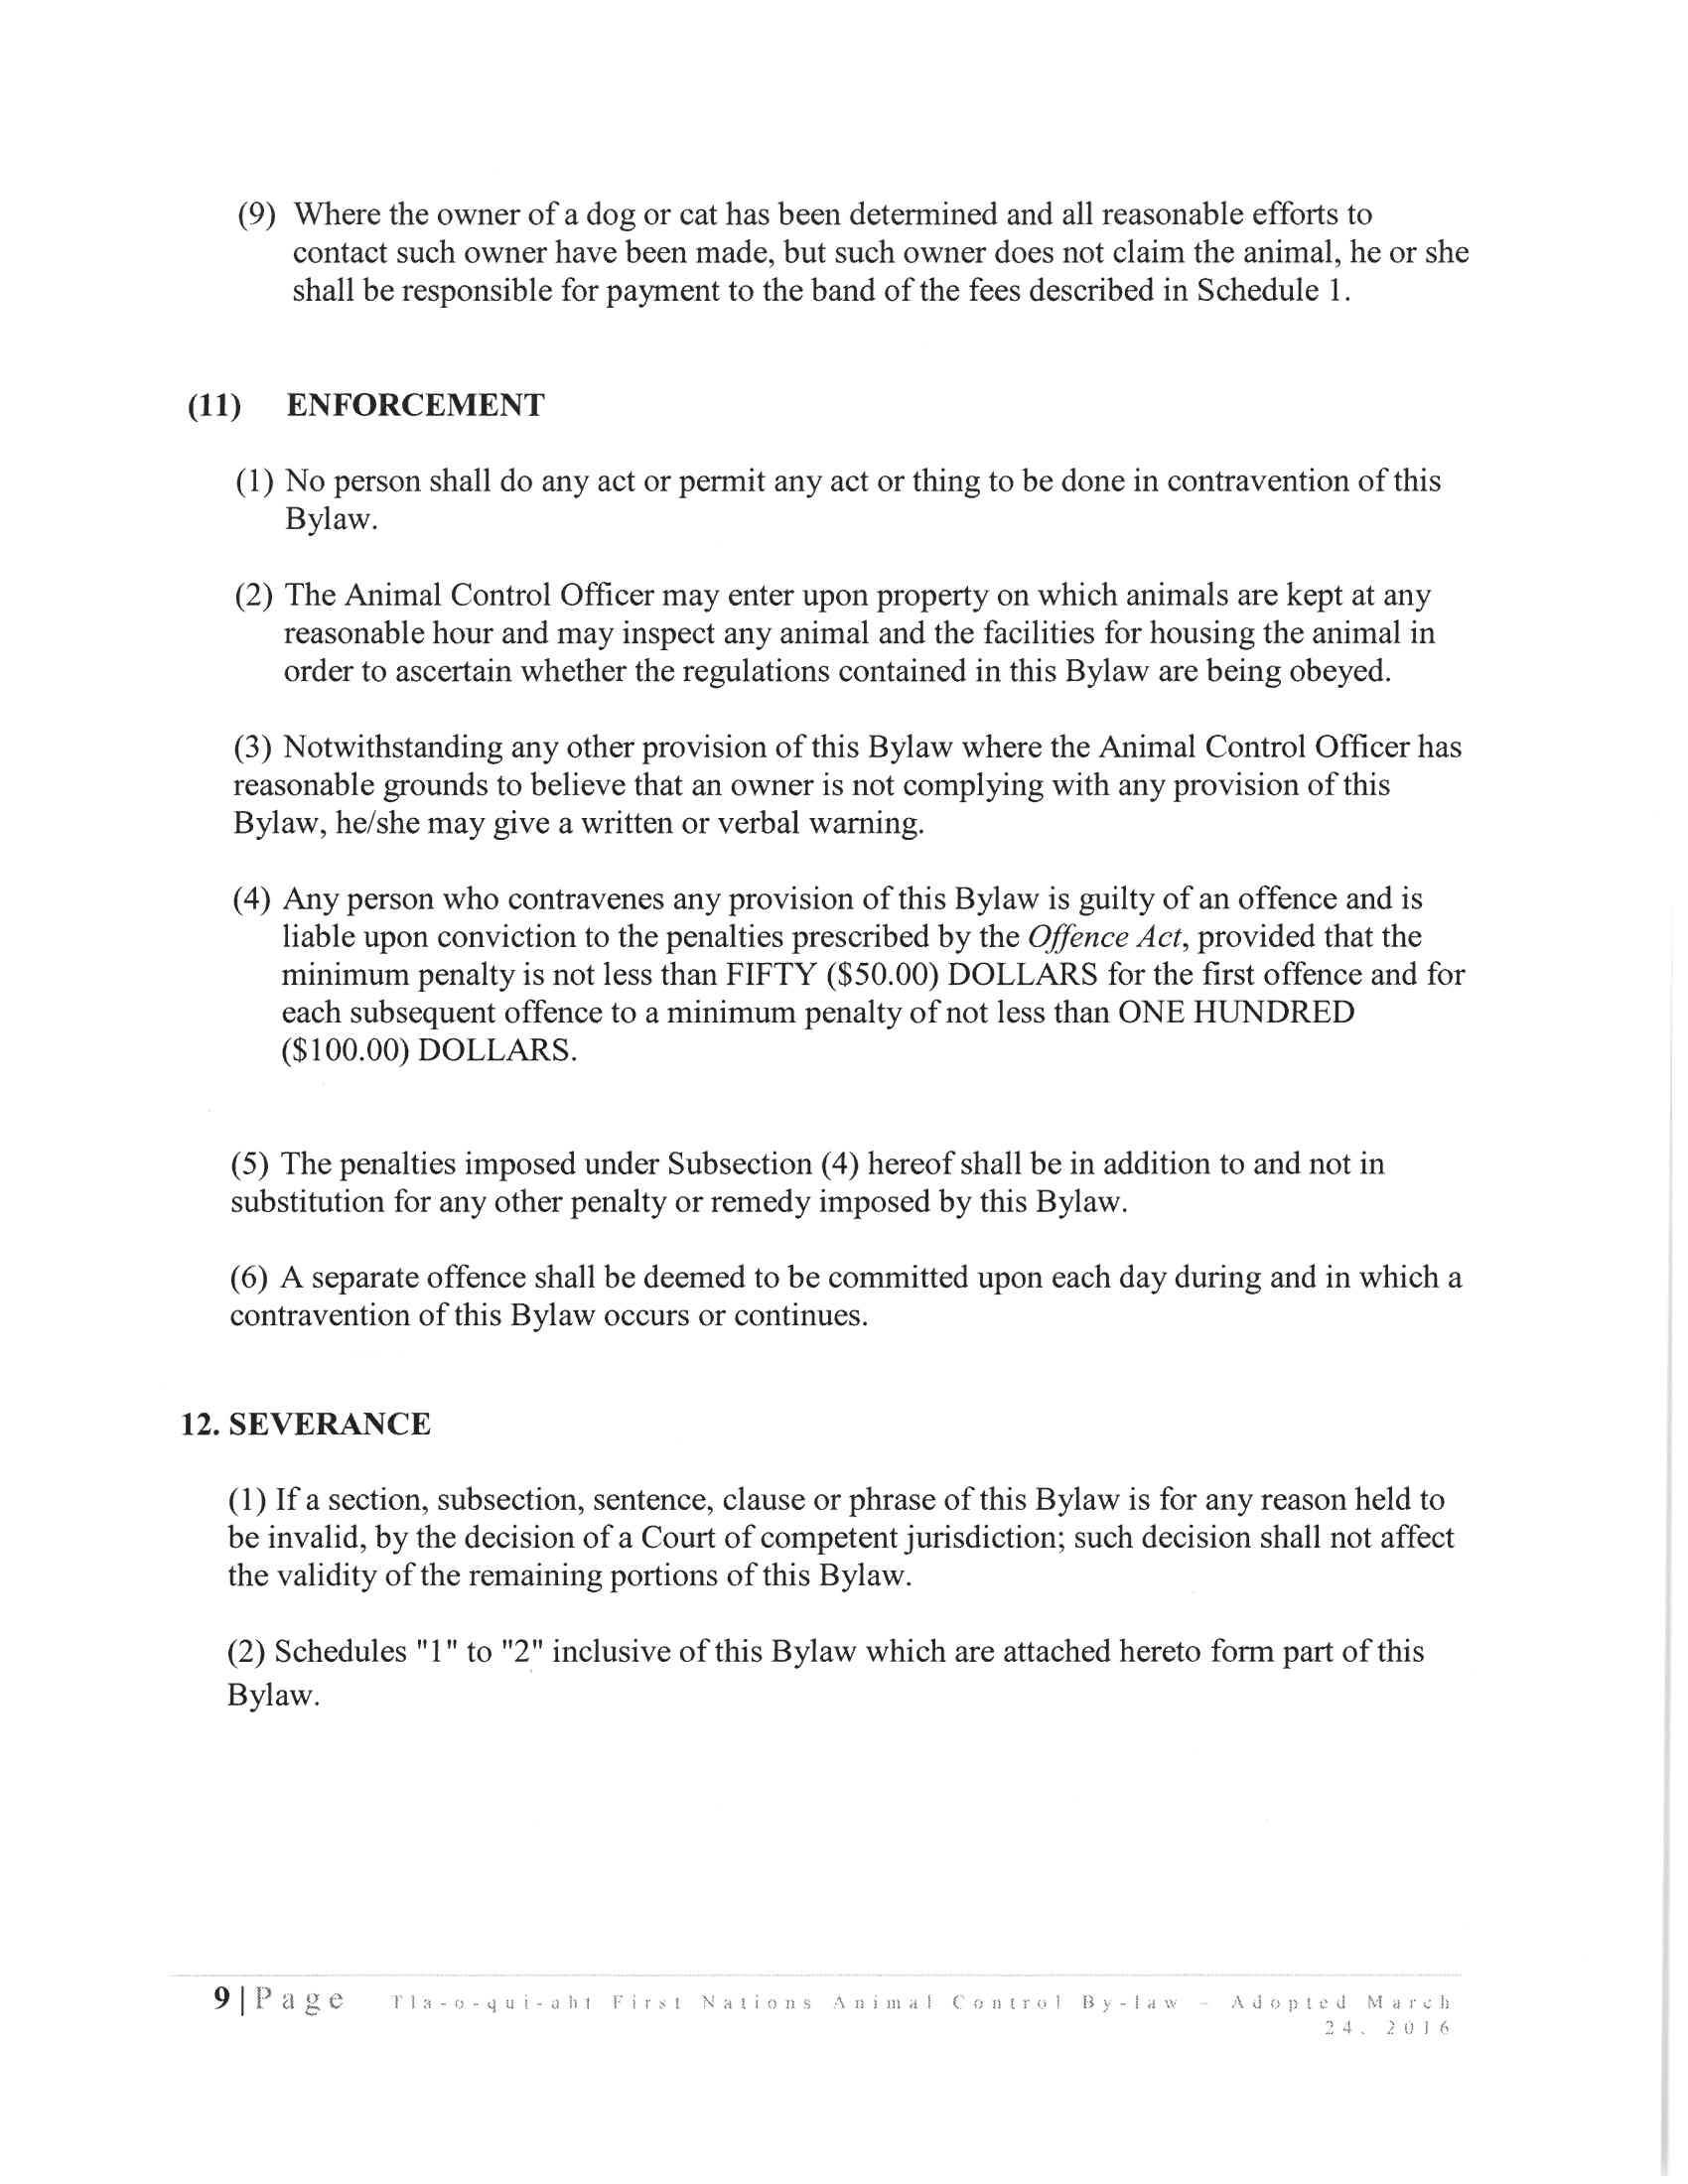 TFN Bulletin Apr 6-2016_Page_31.jpg